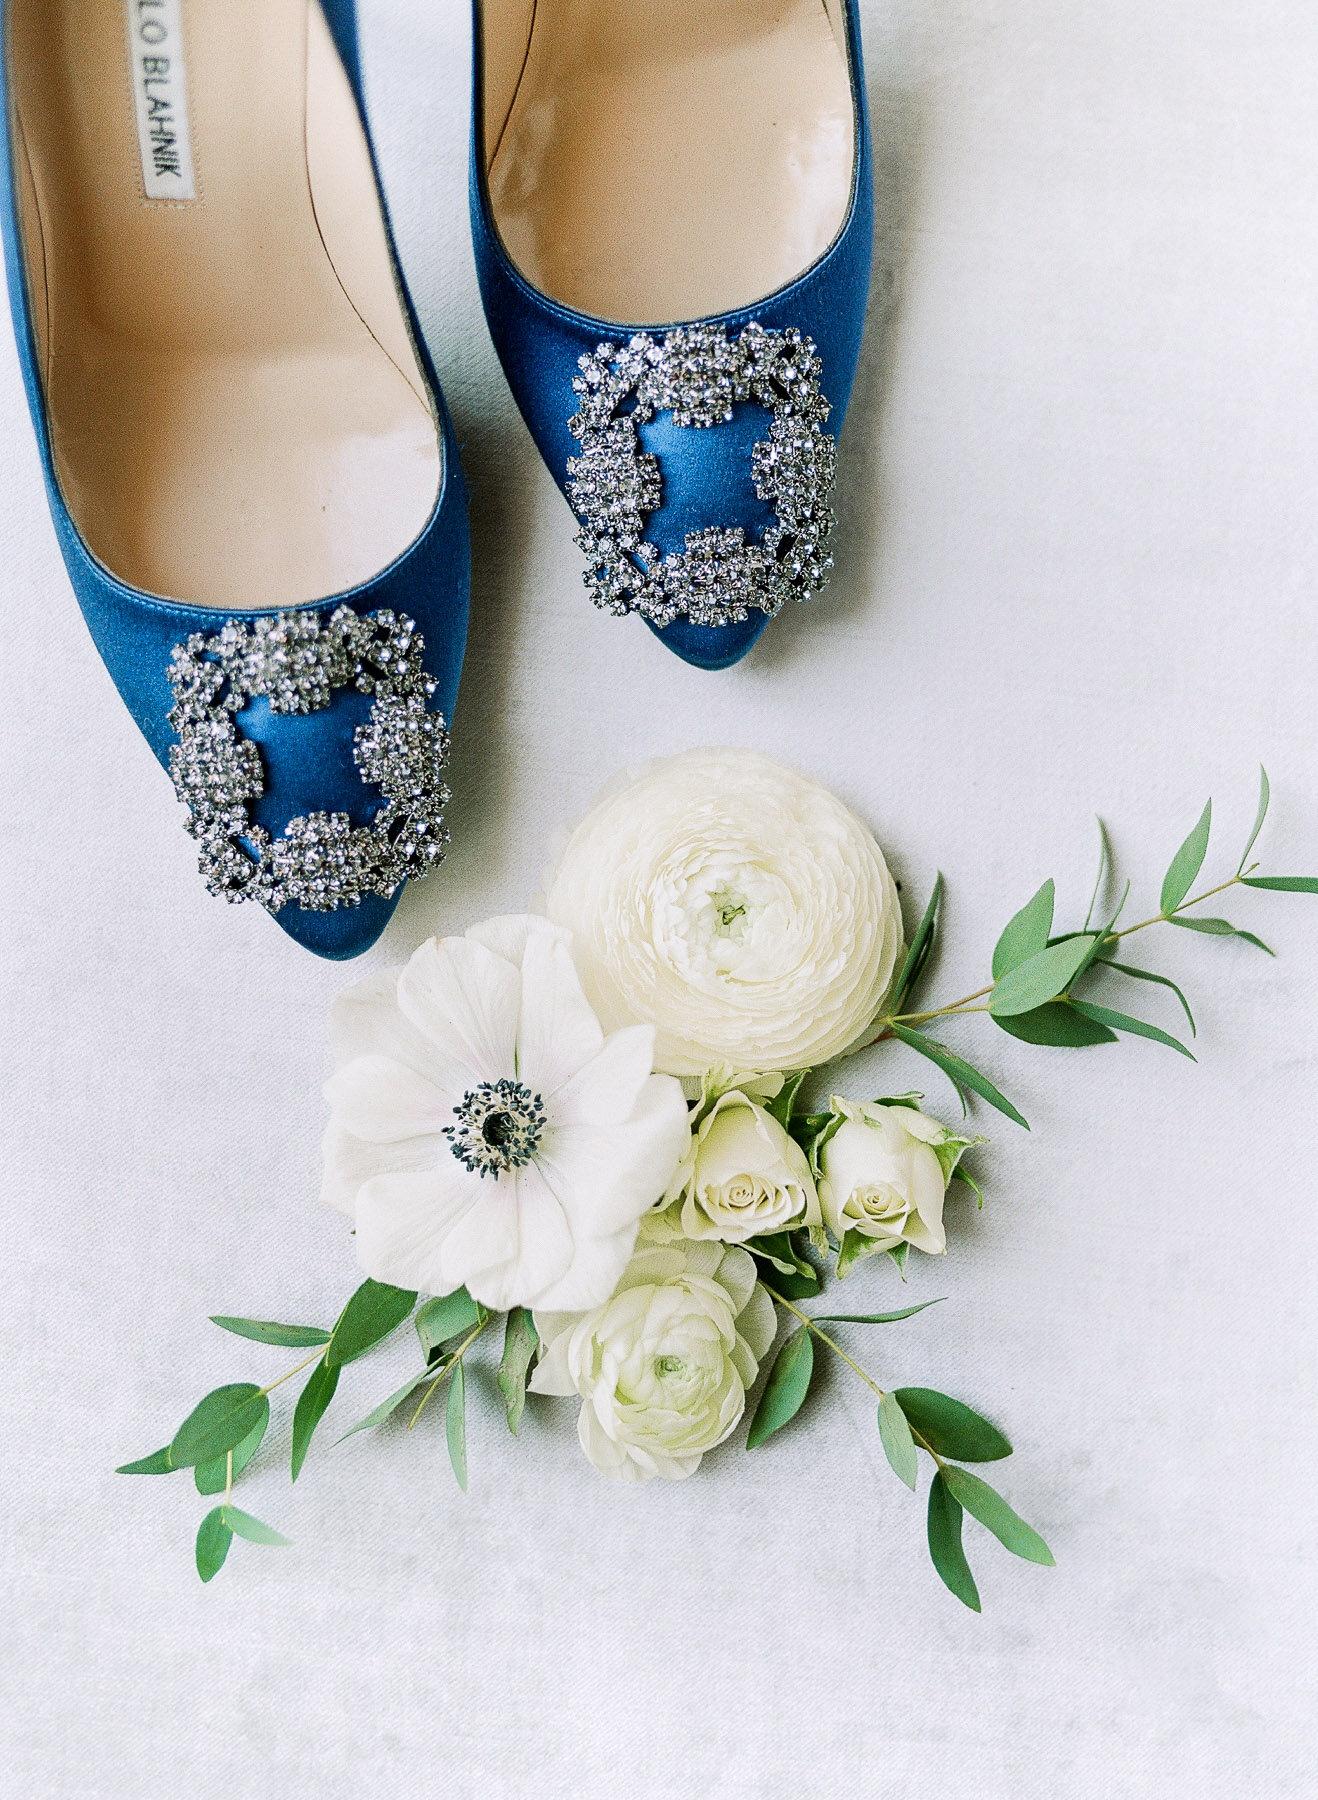 Manolo Blahnik Wedding Shoes